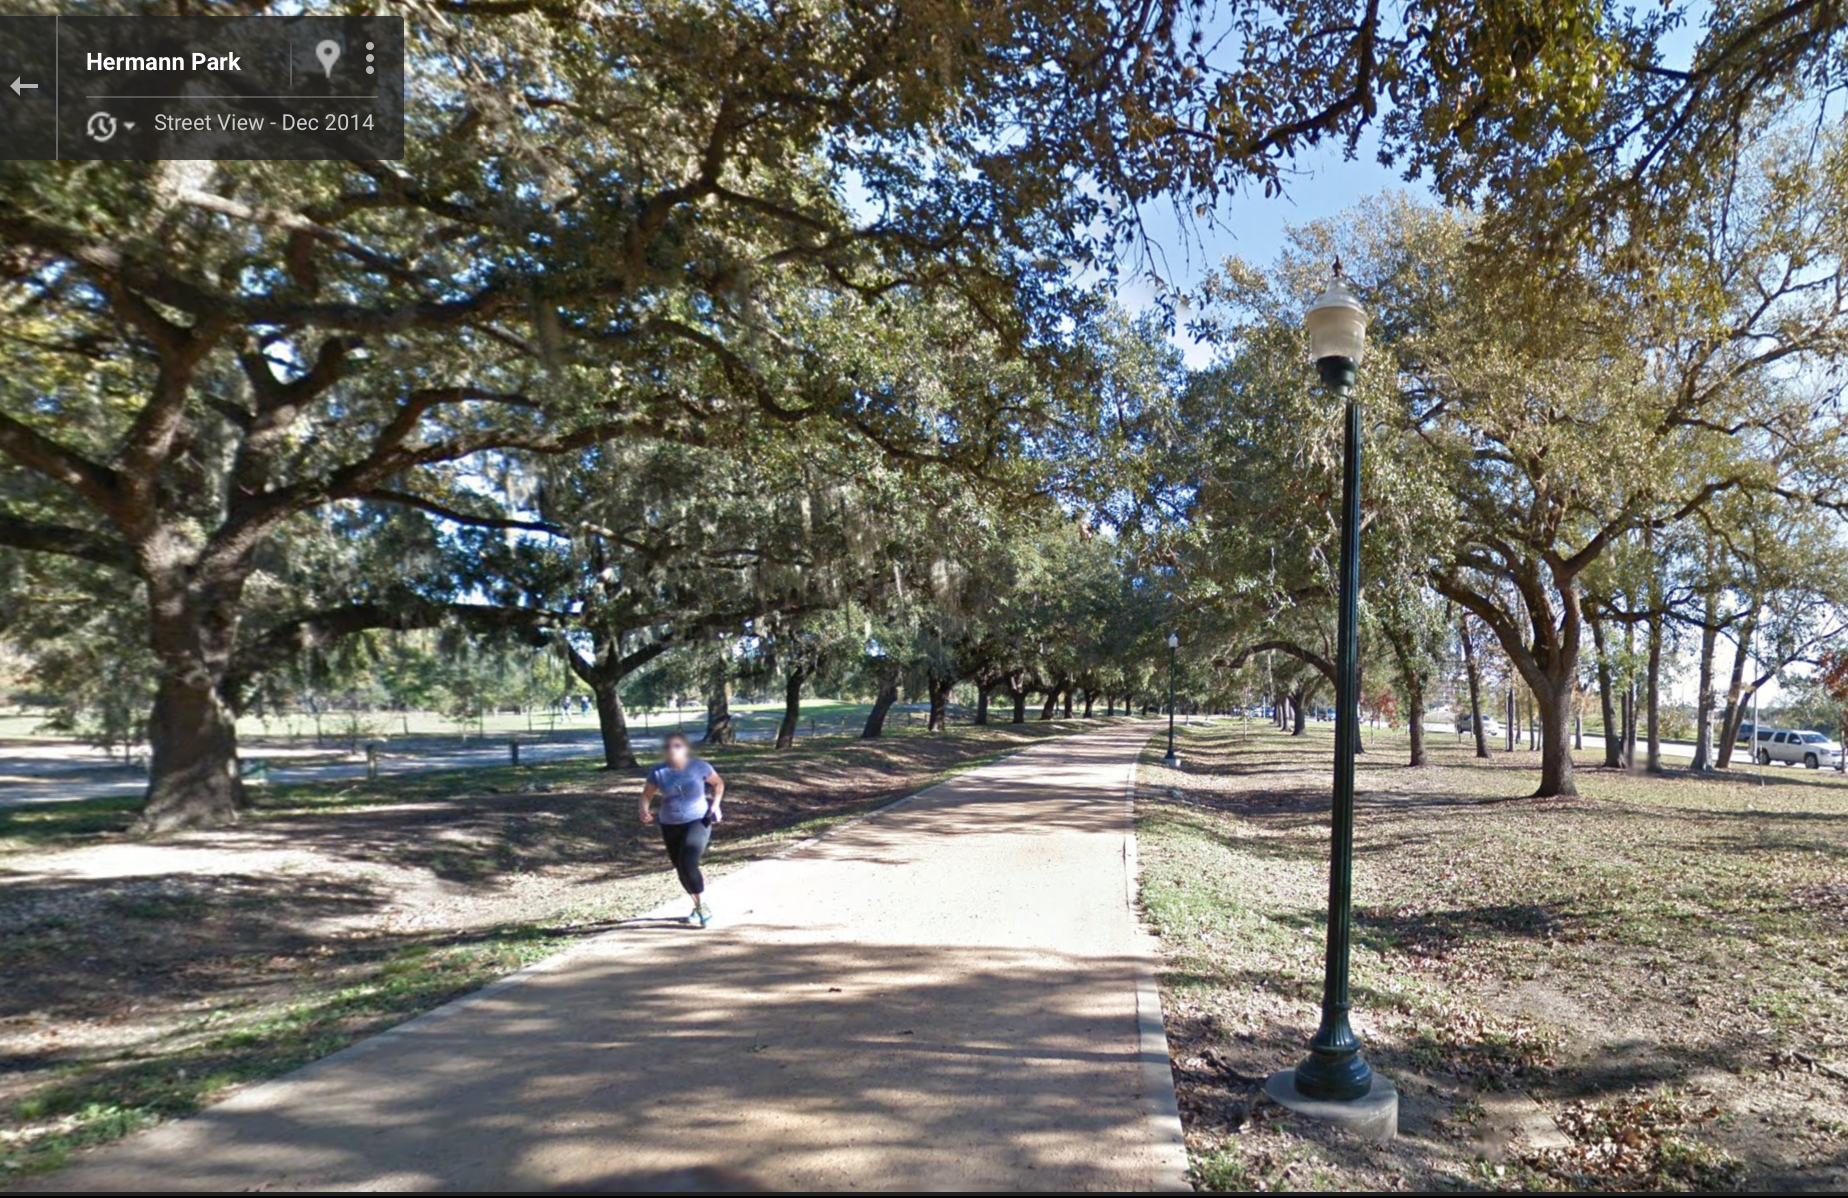 Houston Landmarks Added To Google Maps Street View – Houston Public - Google Maps Street View Houston Texas